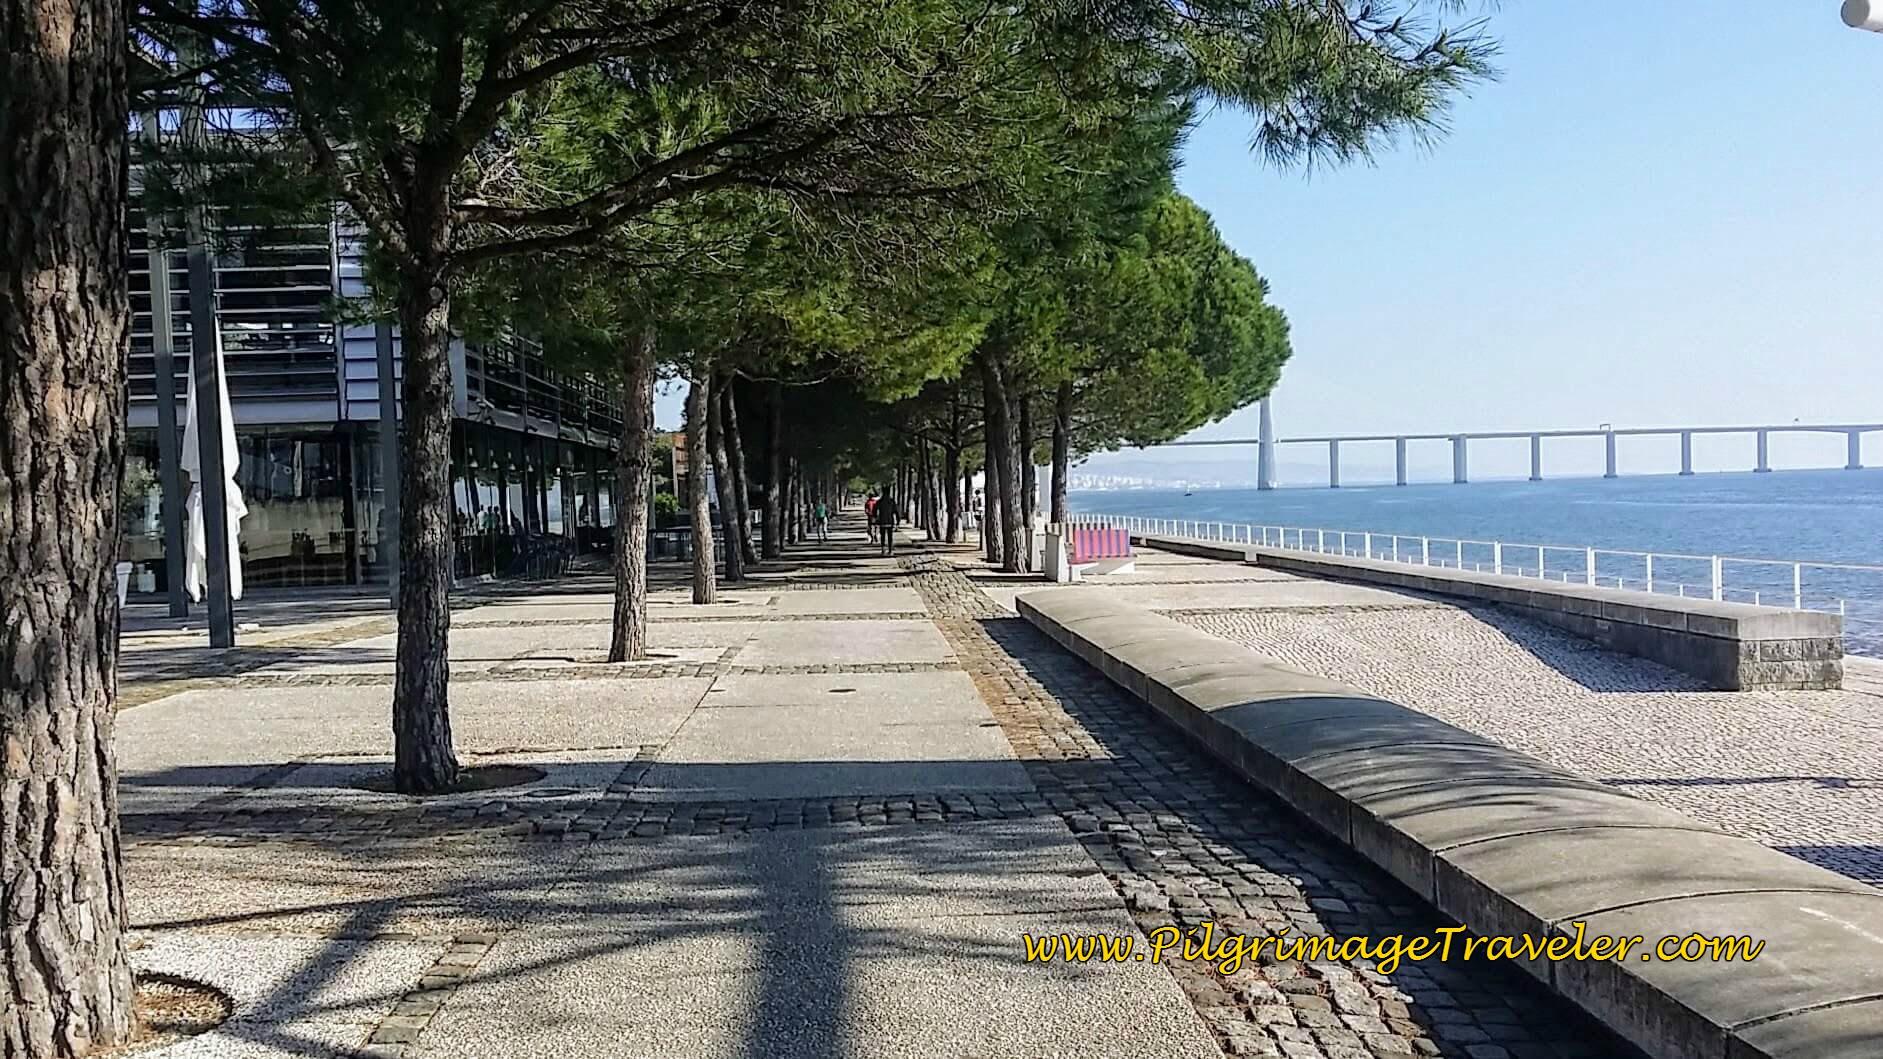 Passeio das Tágides, Park of the Nations, Lisbon